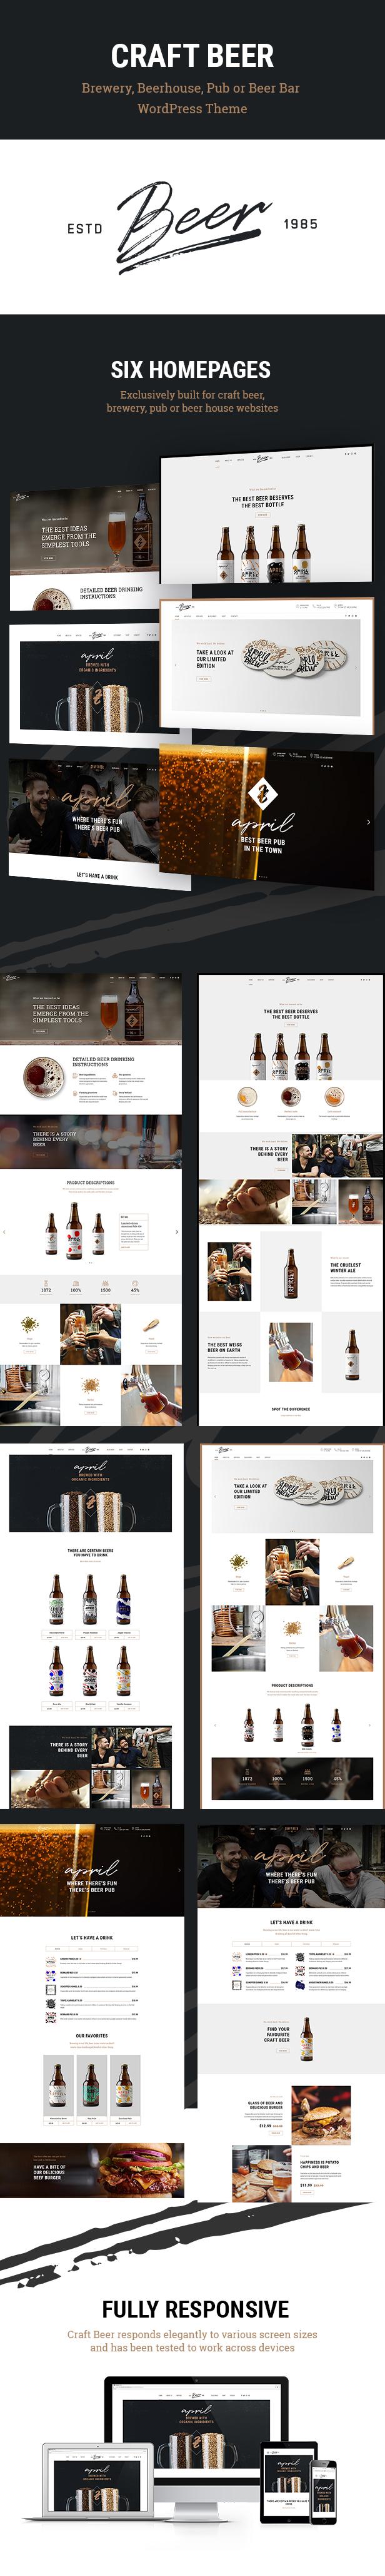 Craft Beer - Brewery & Pub WordPress Theme - 1